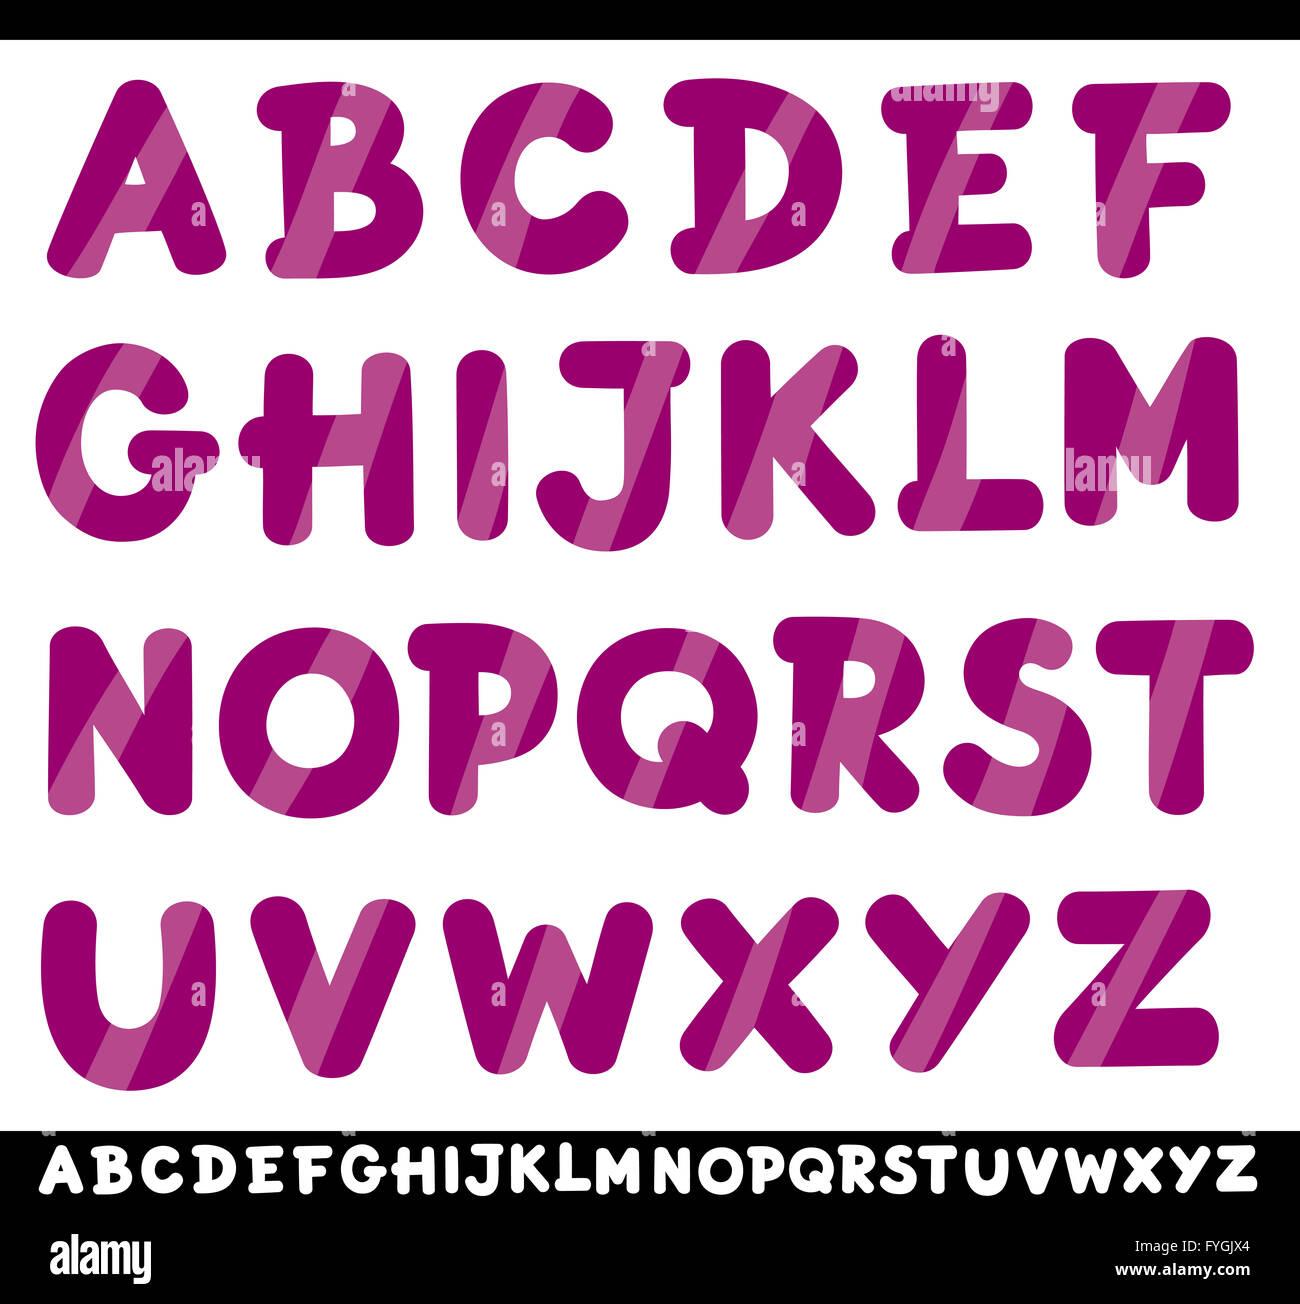 Alphabet Letters Cartoon Stock Photos & Alphabet Letters Cartoon ...